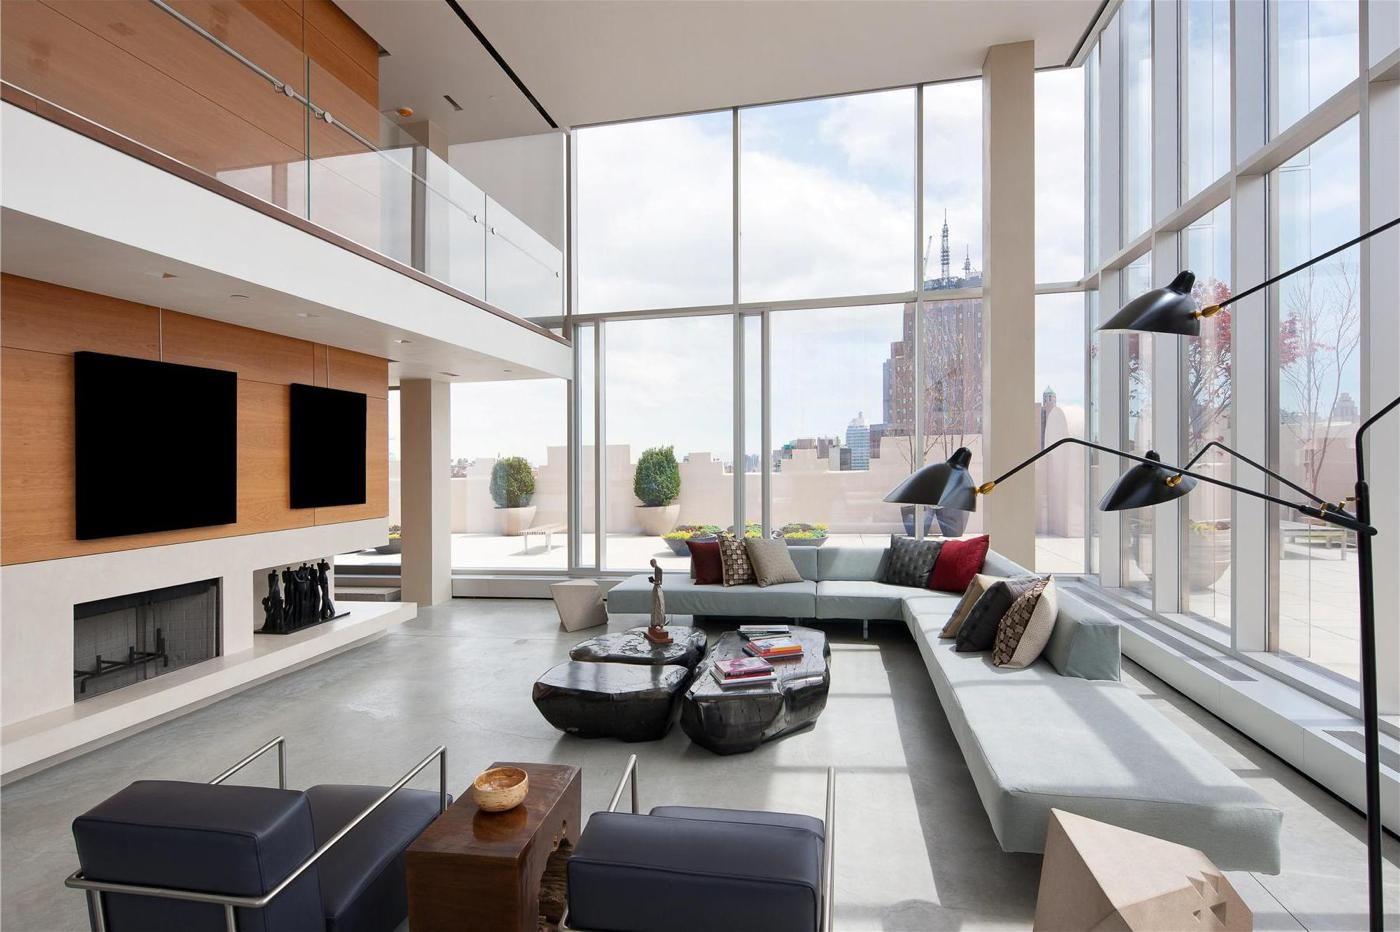 Home Inspiration 12 Amazing New York Loft Apartments Interior Design Living Room Lounge Home